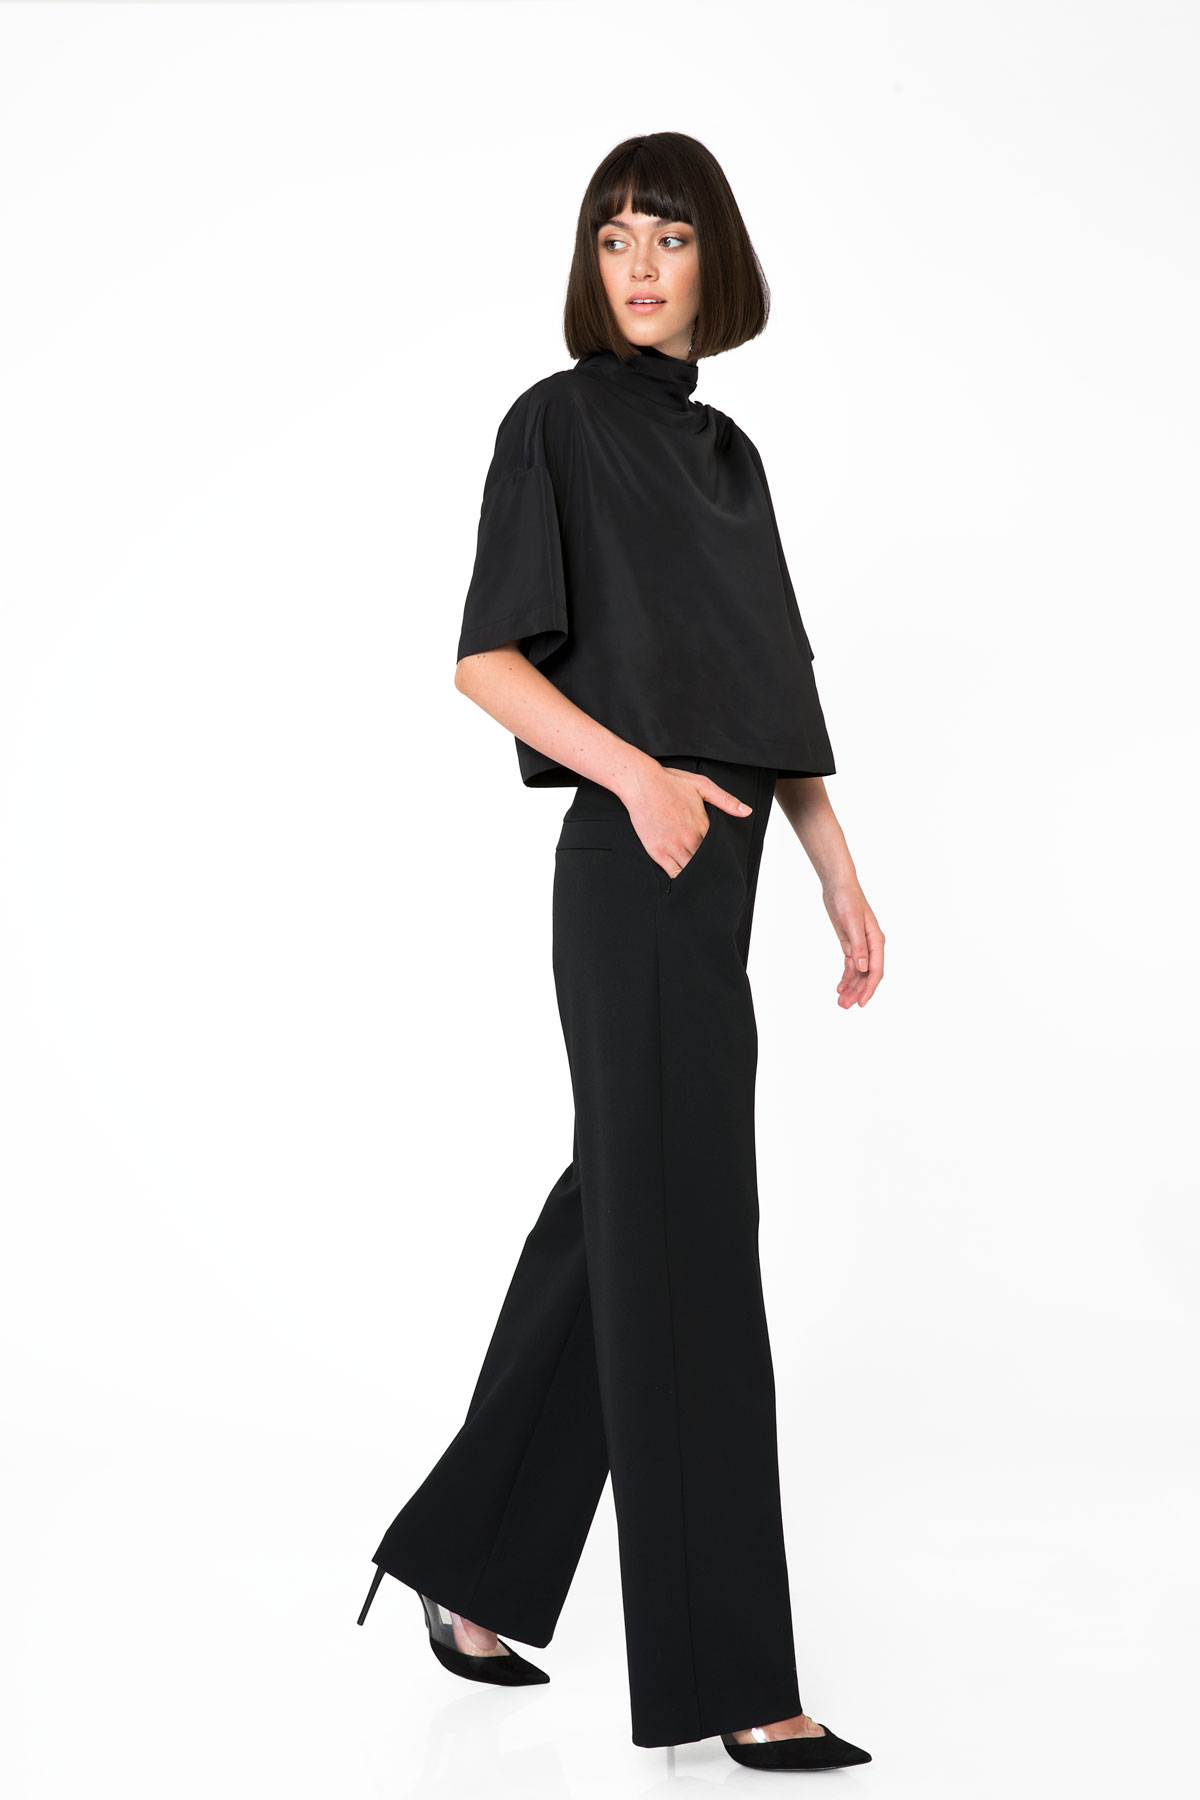 High Waist Black Trousers